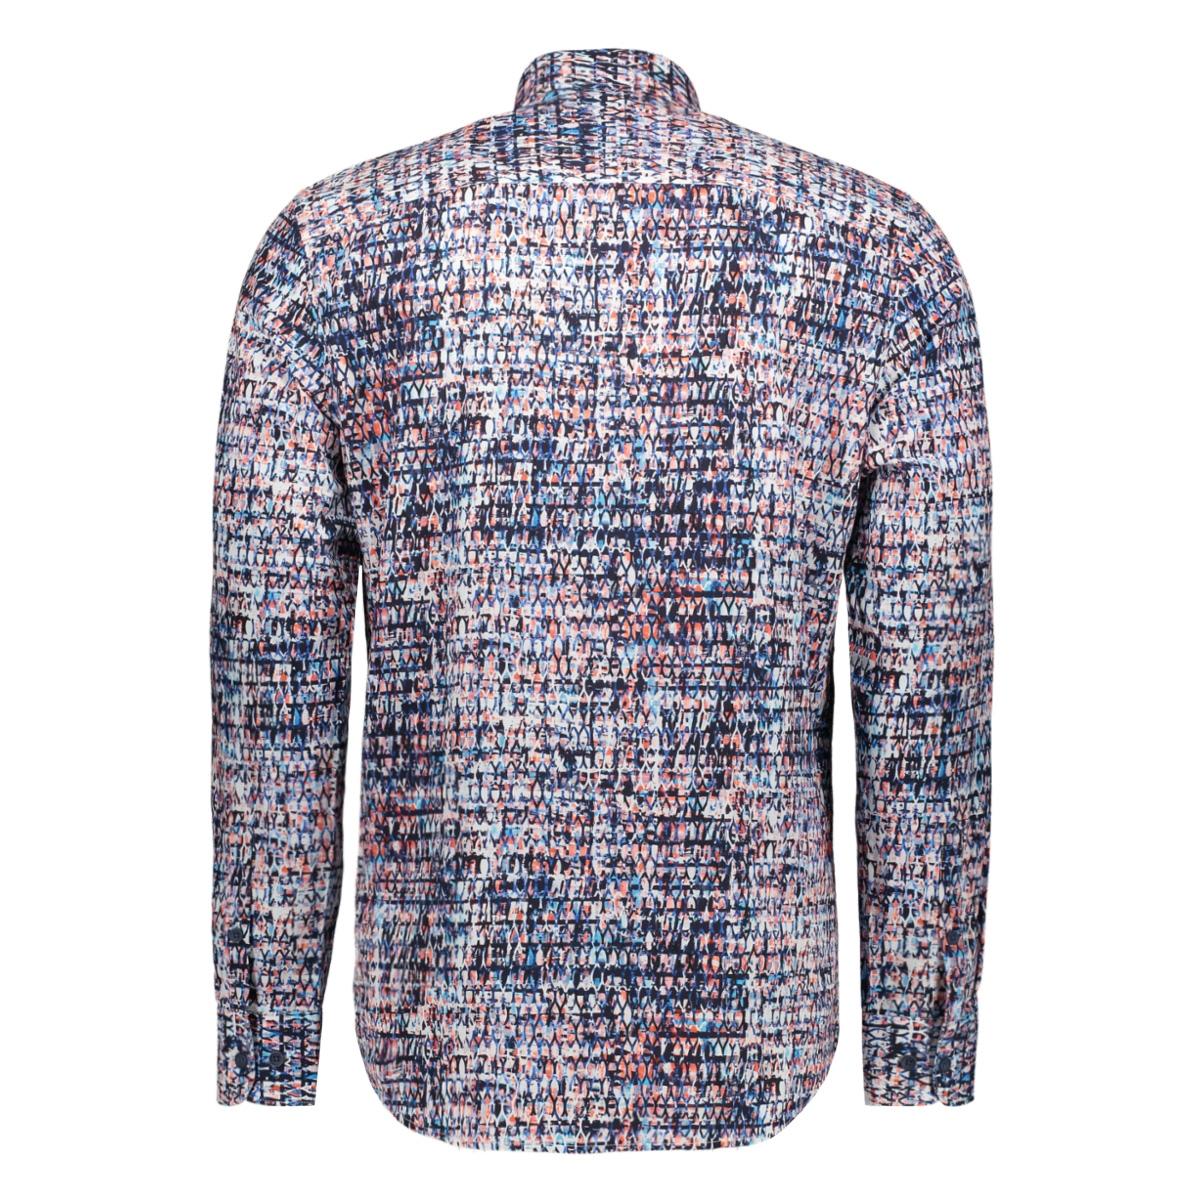 overhemd met print 29d1125t lerros overhemd 925